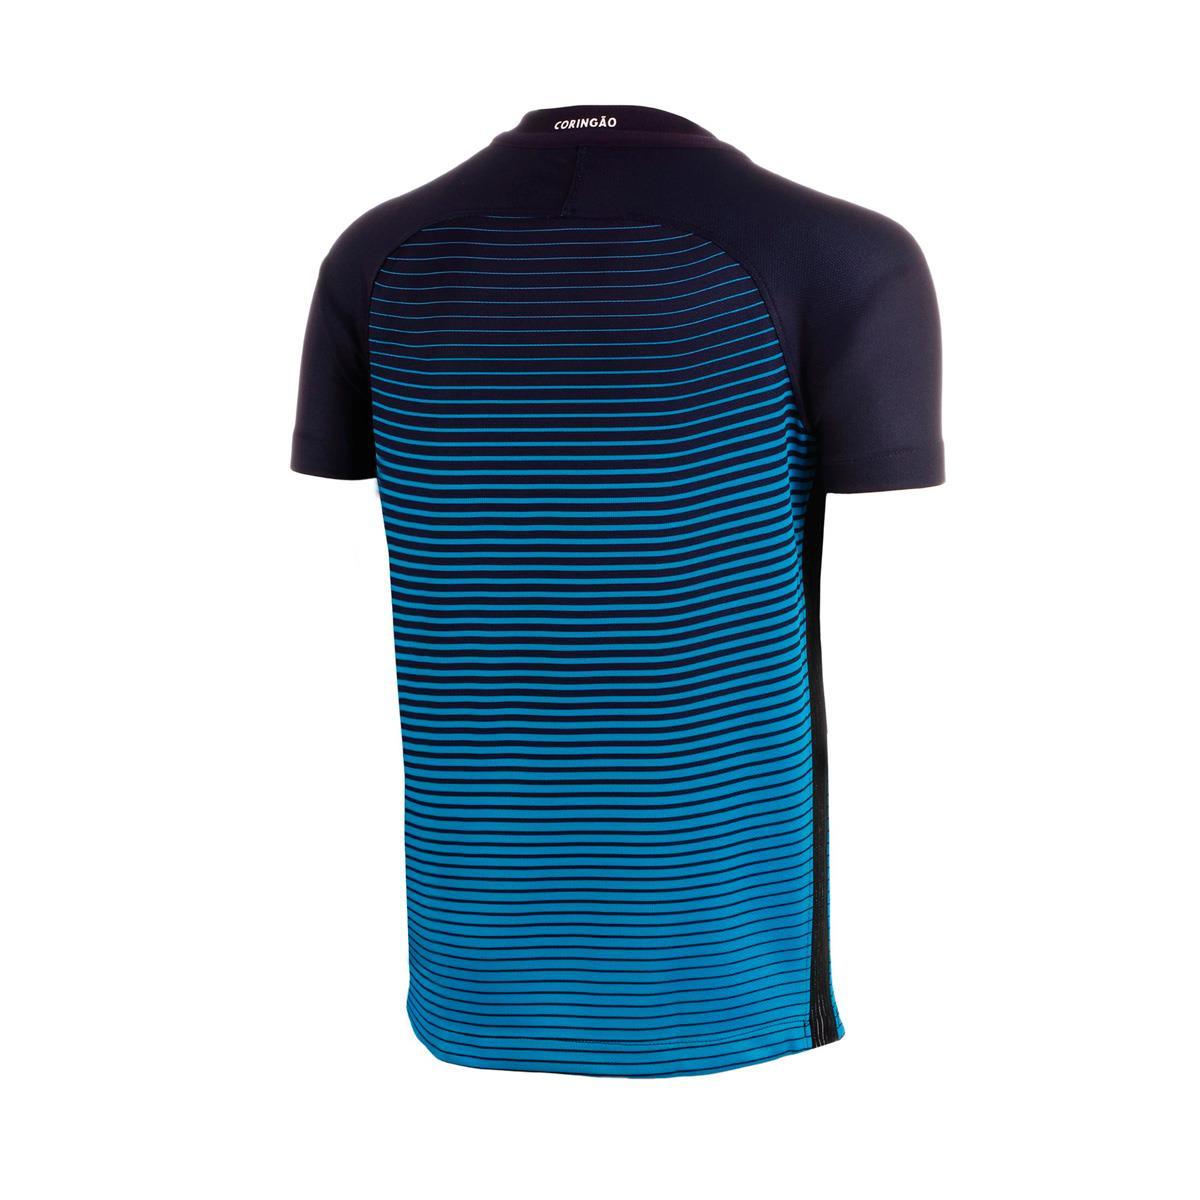 Camisa Nike Corinthians III 2016 2017 Torcedor Masculina 9ad6ce57b2f06